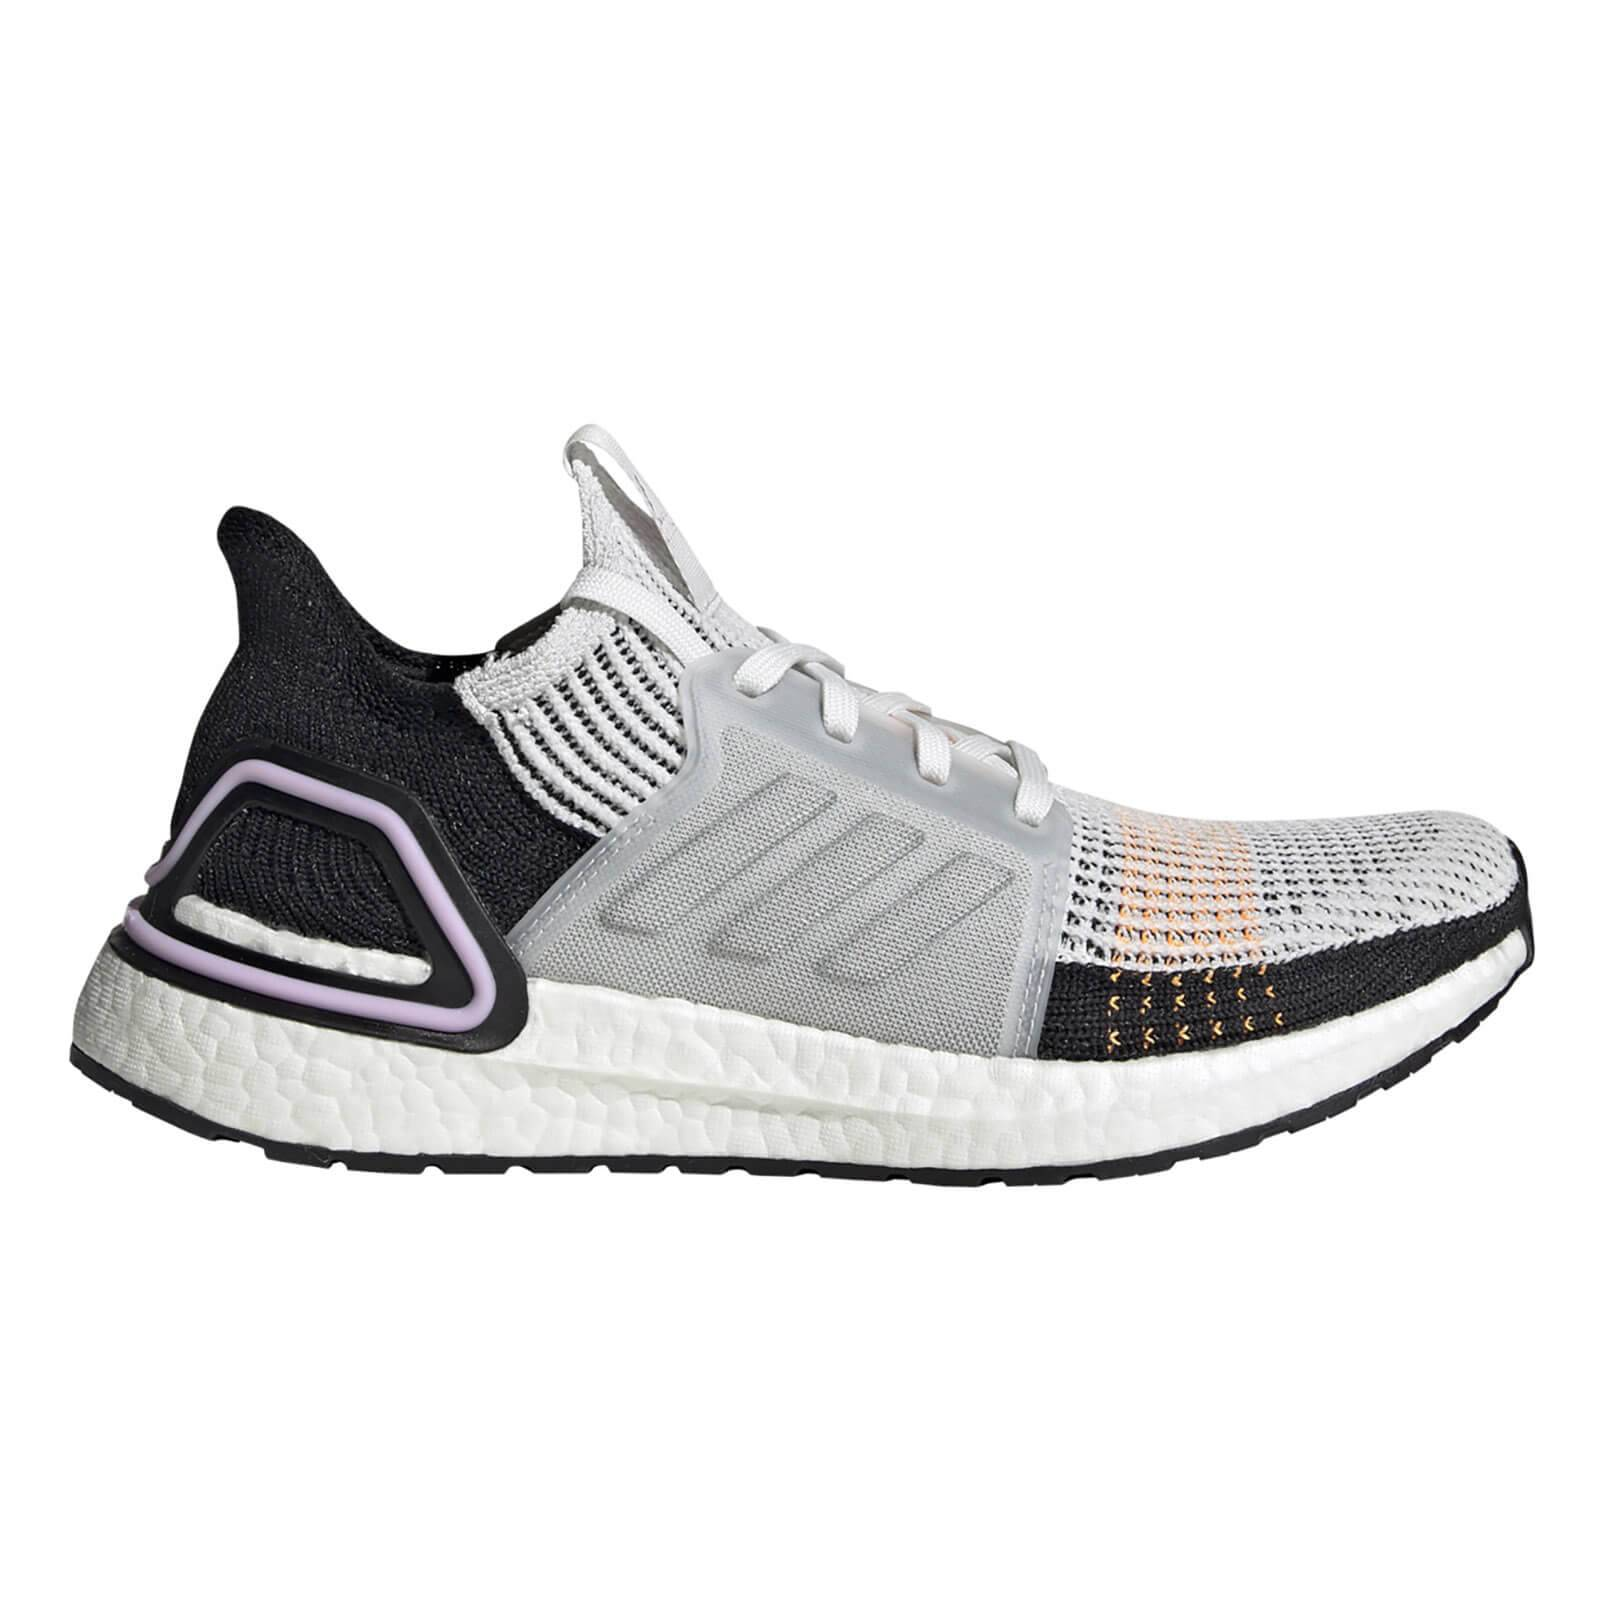 adidas Women's Ultraboost 19 Running Shoes - White/Black - 4.5